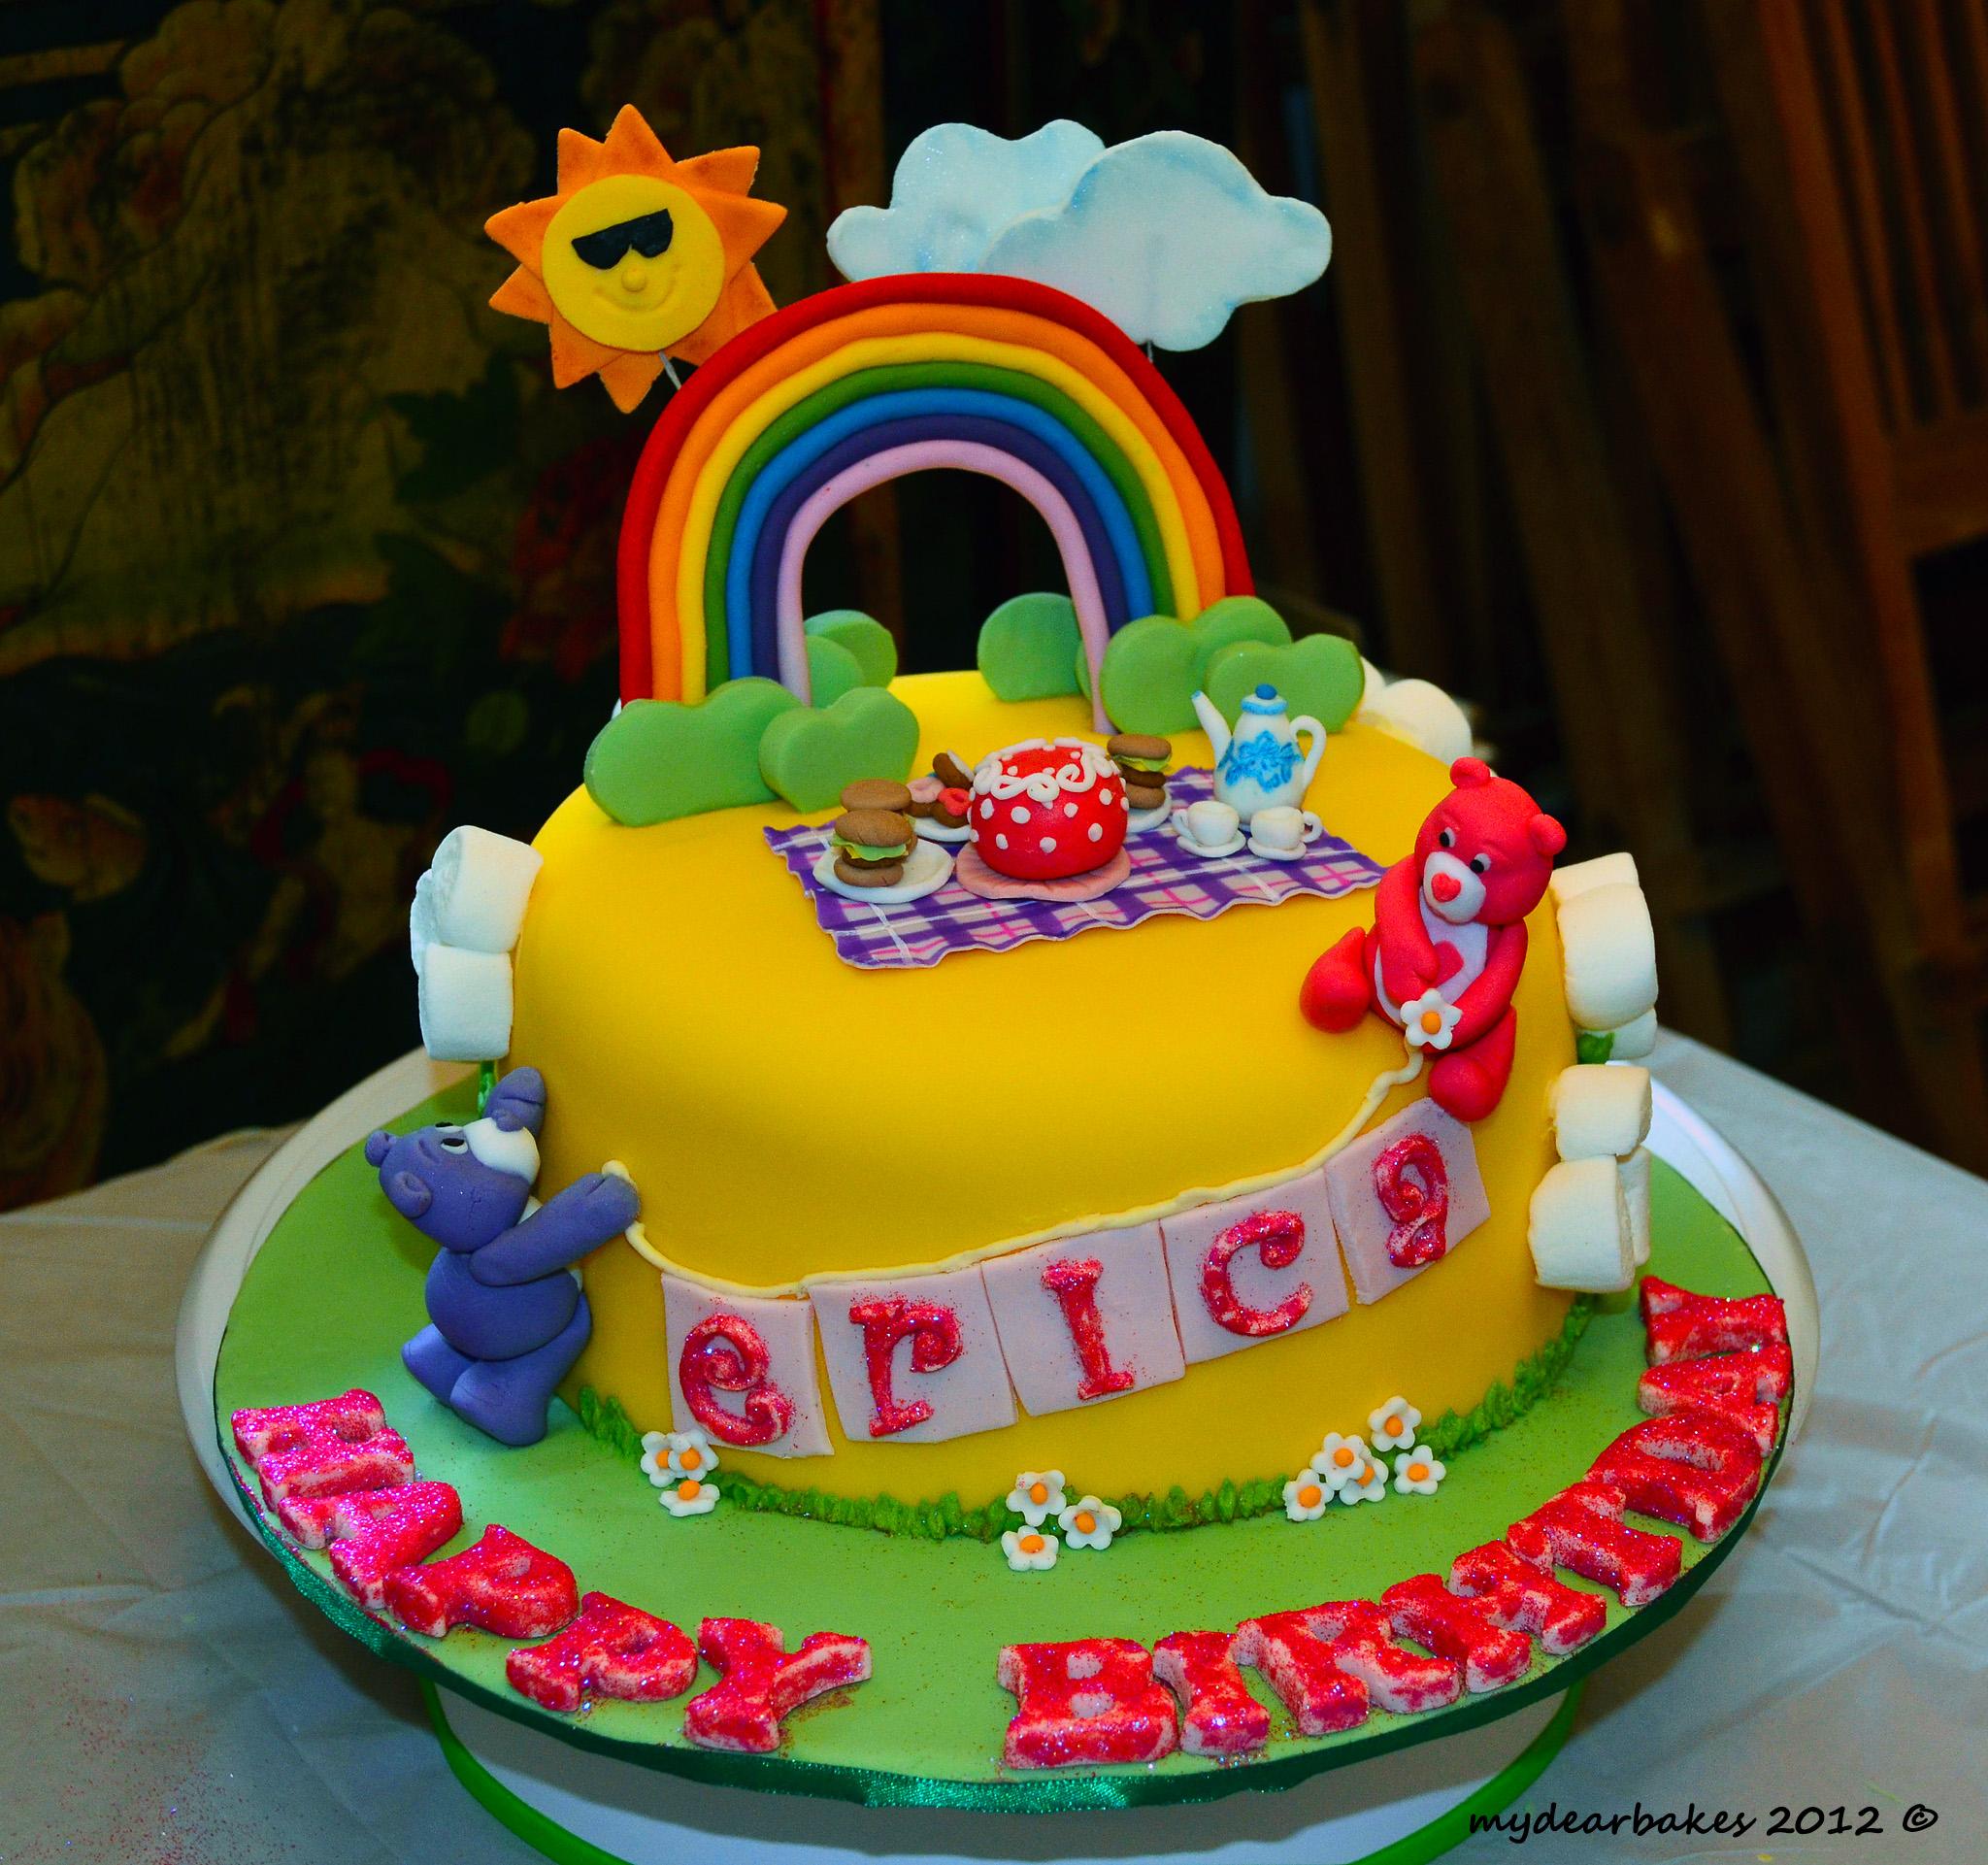 Happy Birthday Erica Drivel Faithless Street